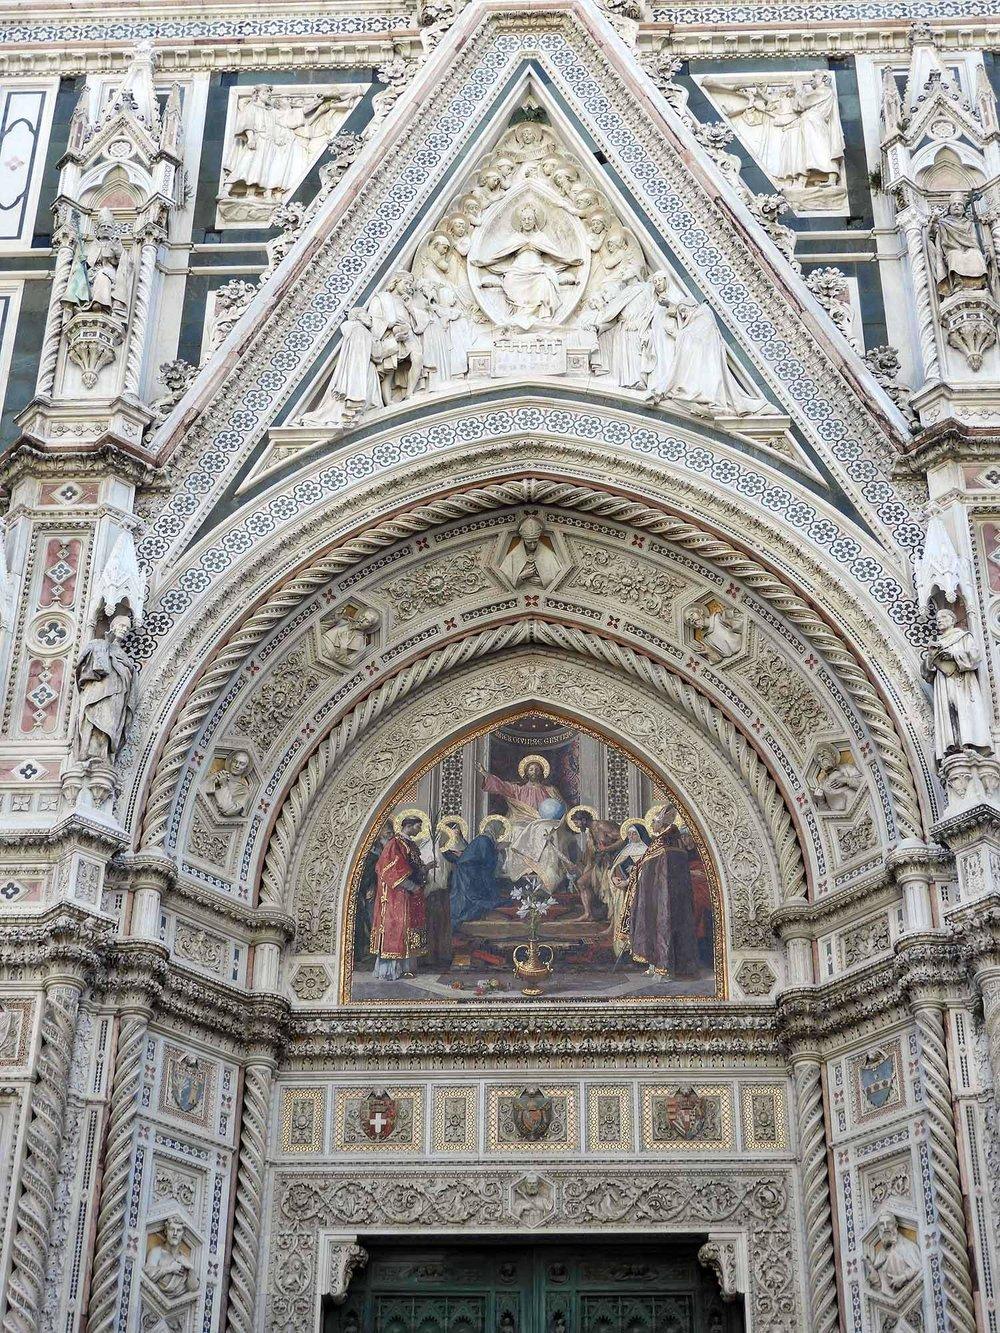 italy-italia-florence-cathedral-santa-maria-del-fiori-doorway-arch-christ.JPG